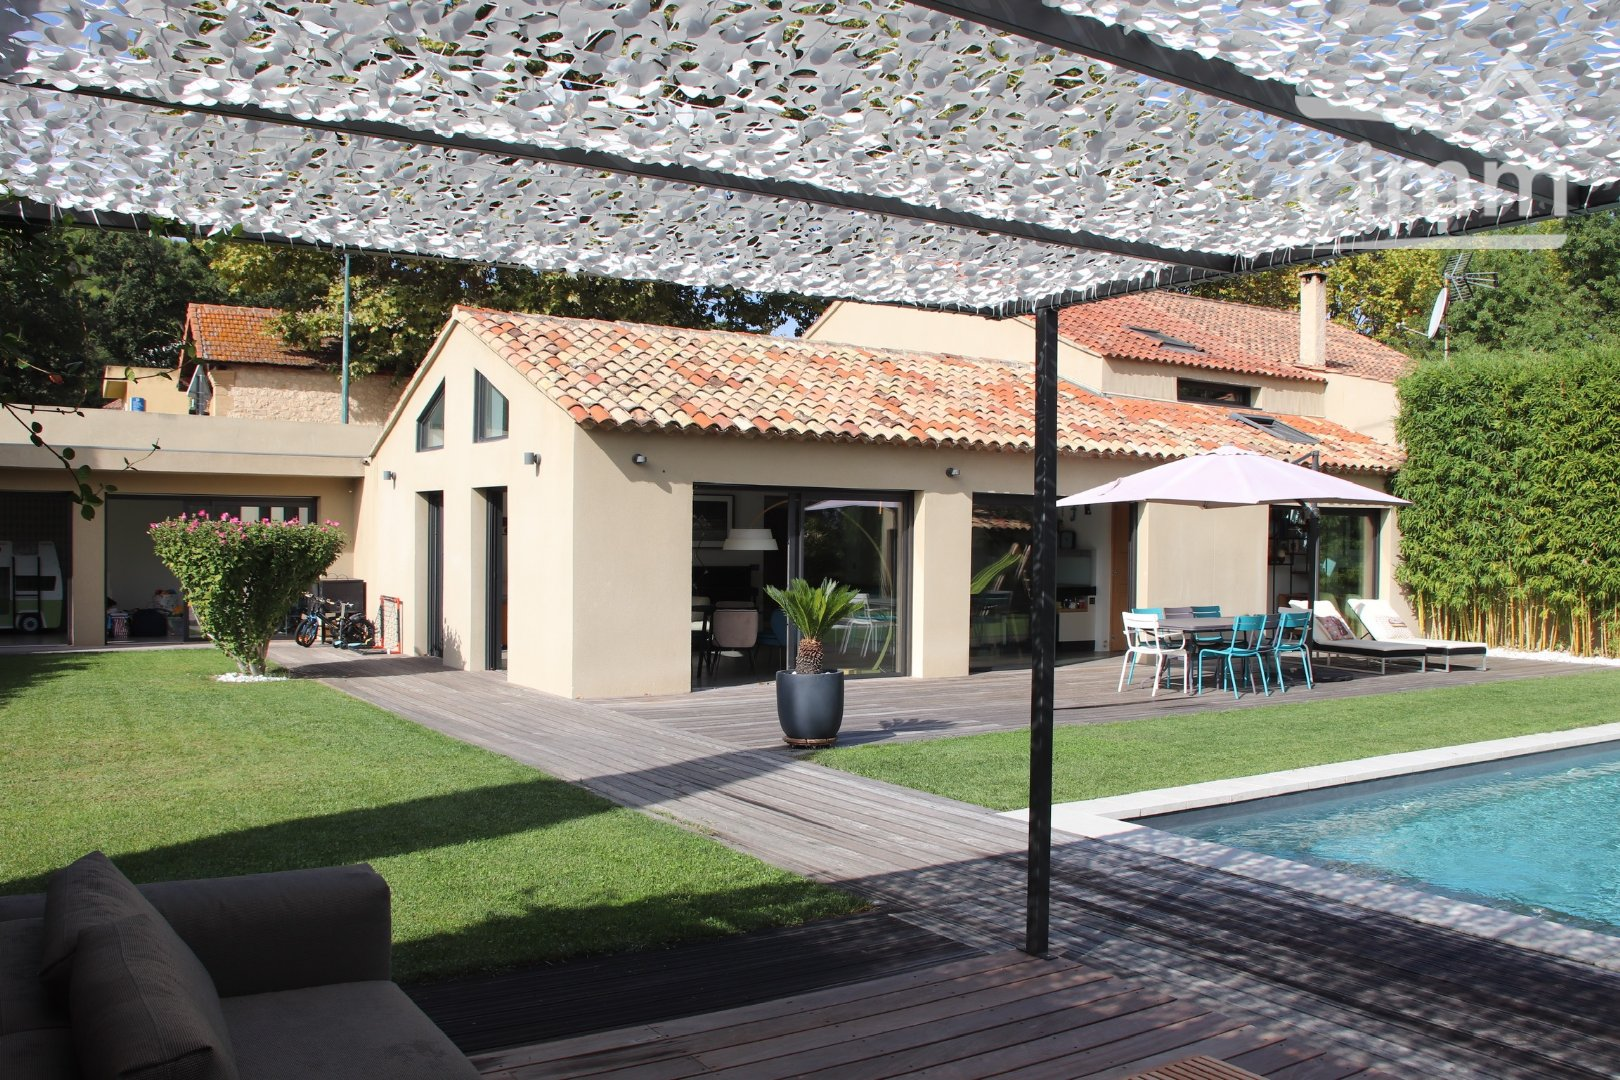 location maison/villa 6 pièces LE PUY SAINTE REPARADE 13610